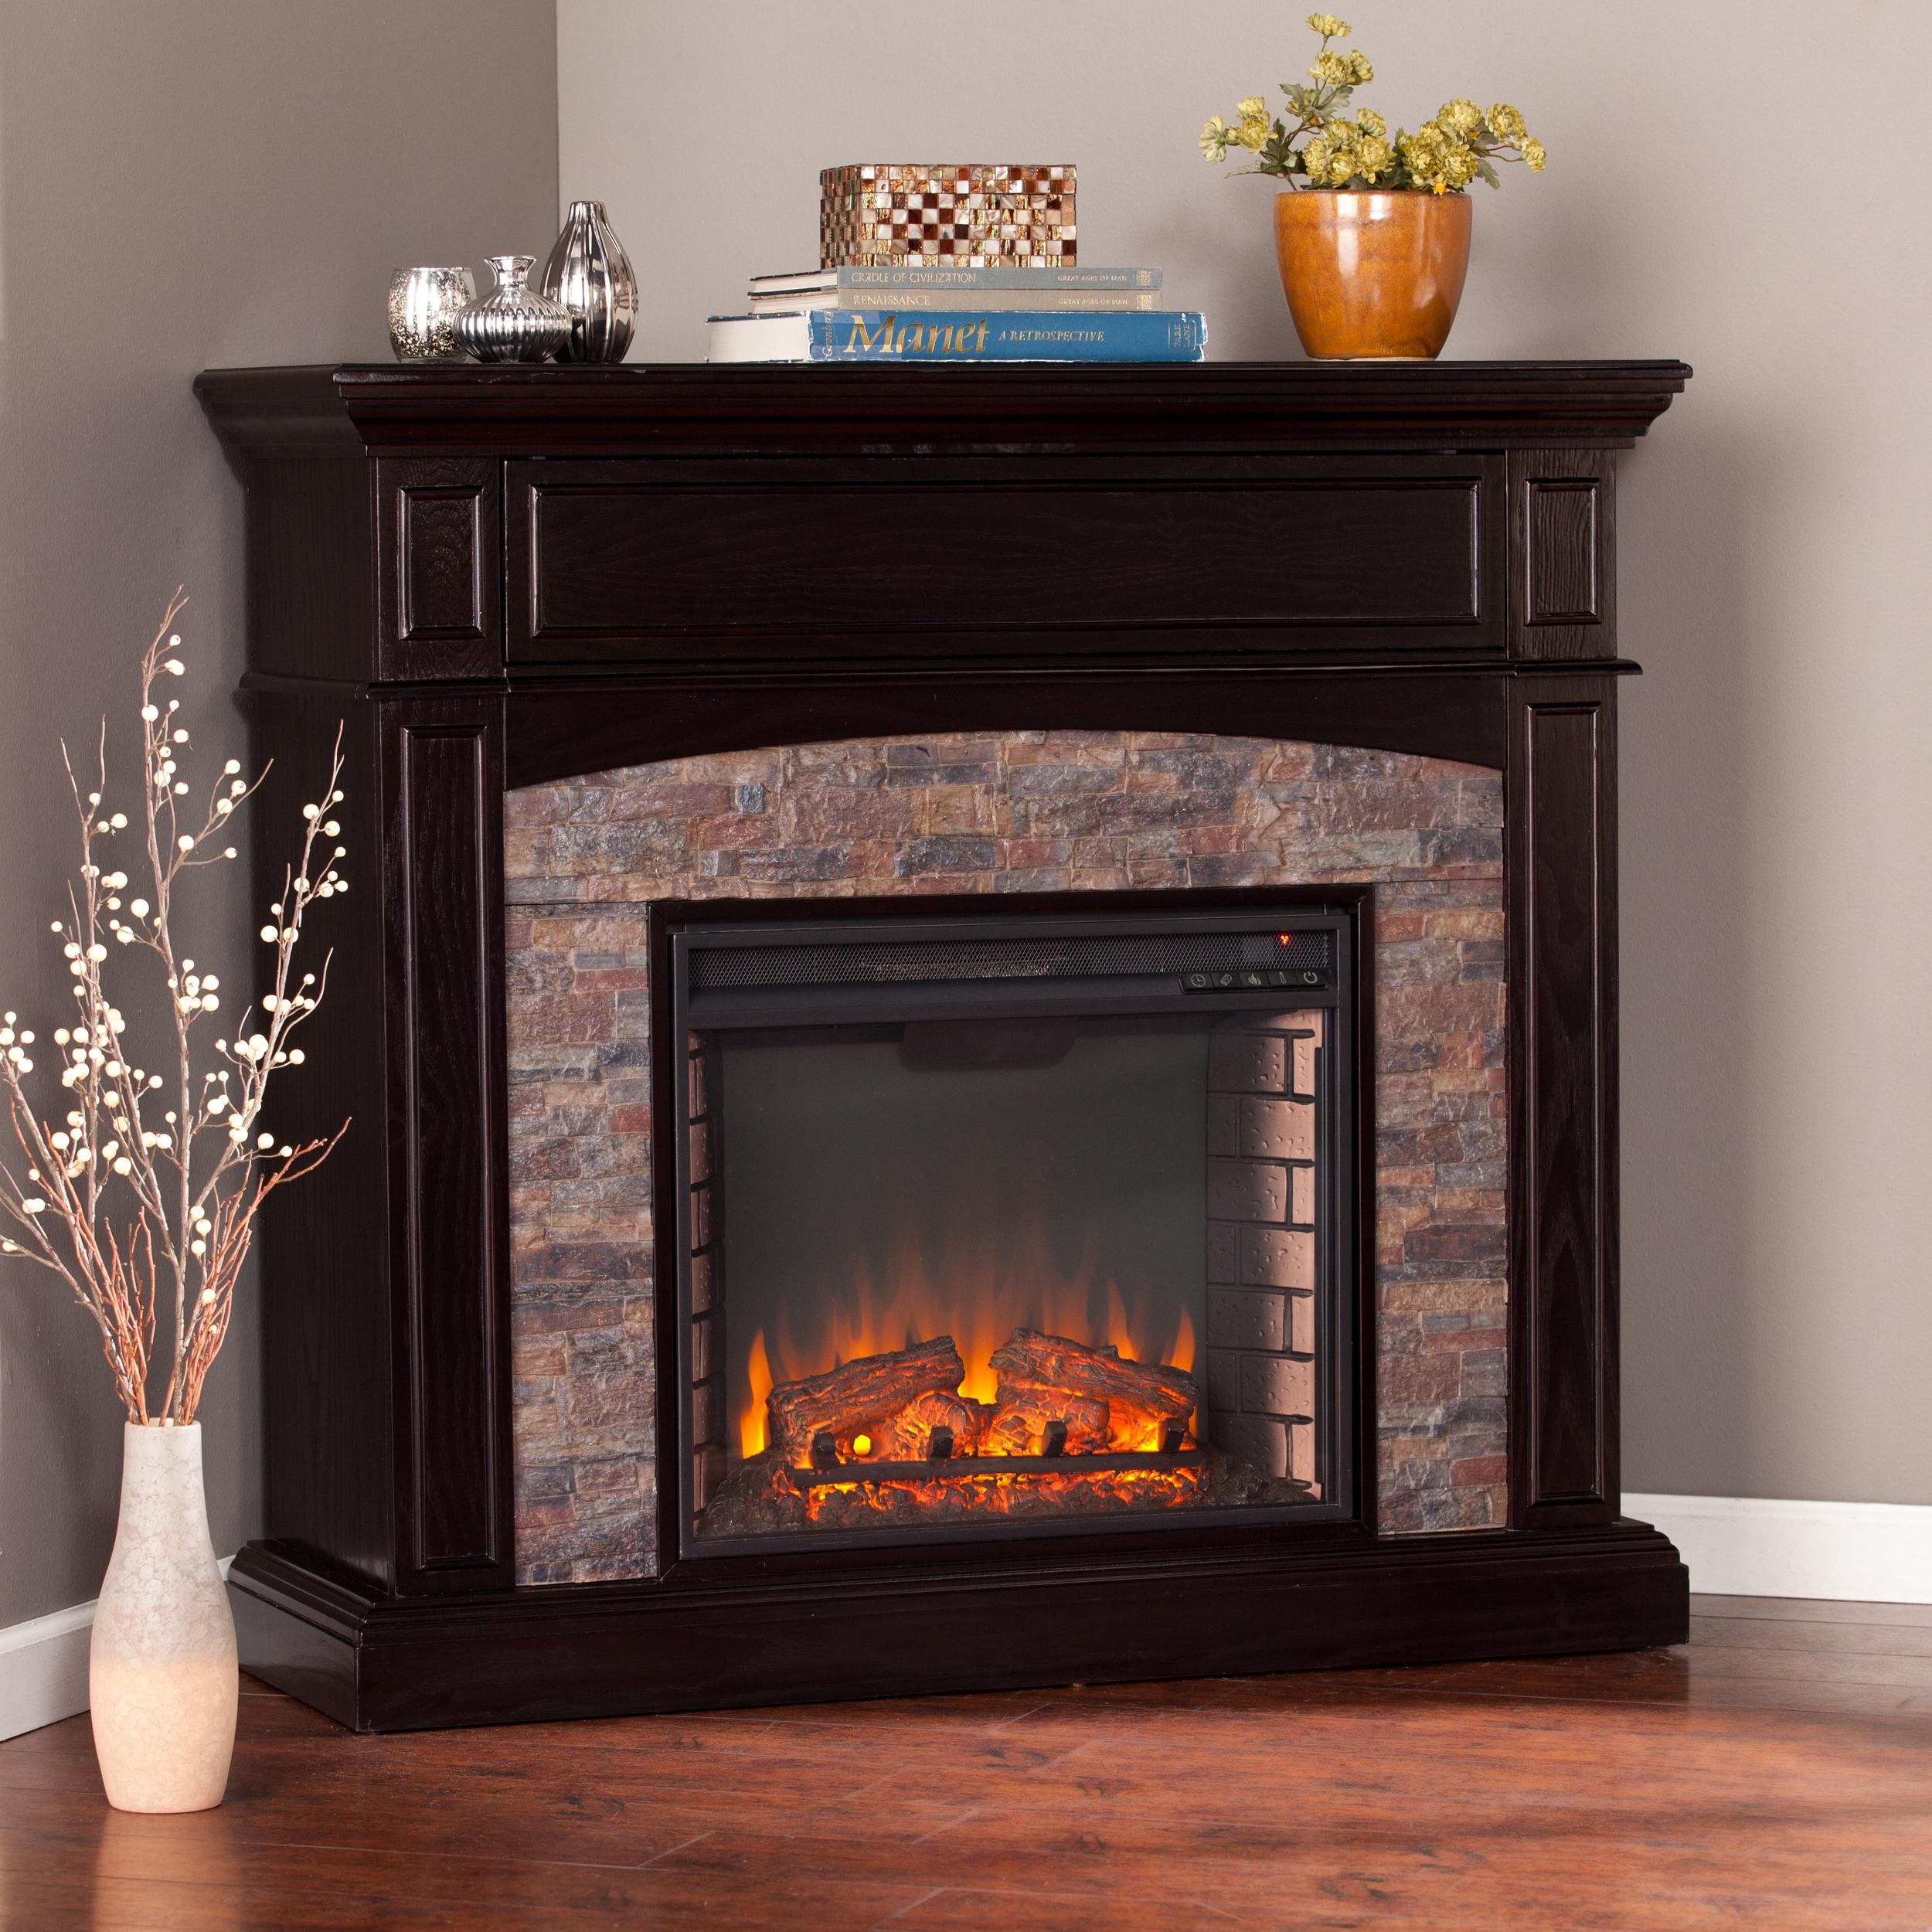 Corner Fireplace: Shop Harper Blvd Fowler Ebony Faux Stone Corner Electric